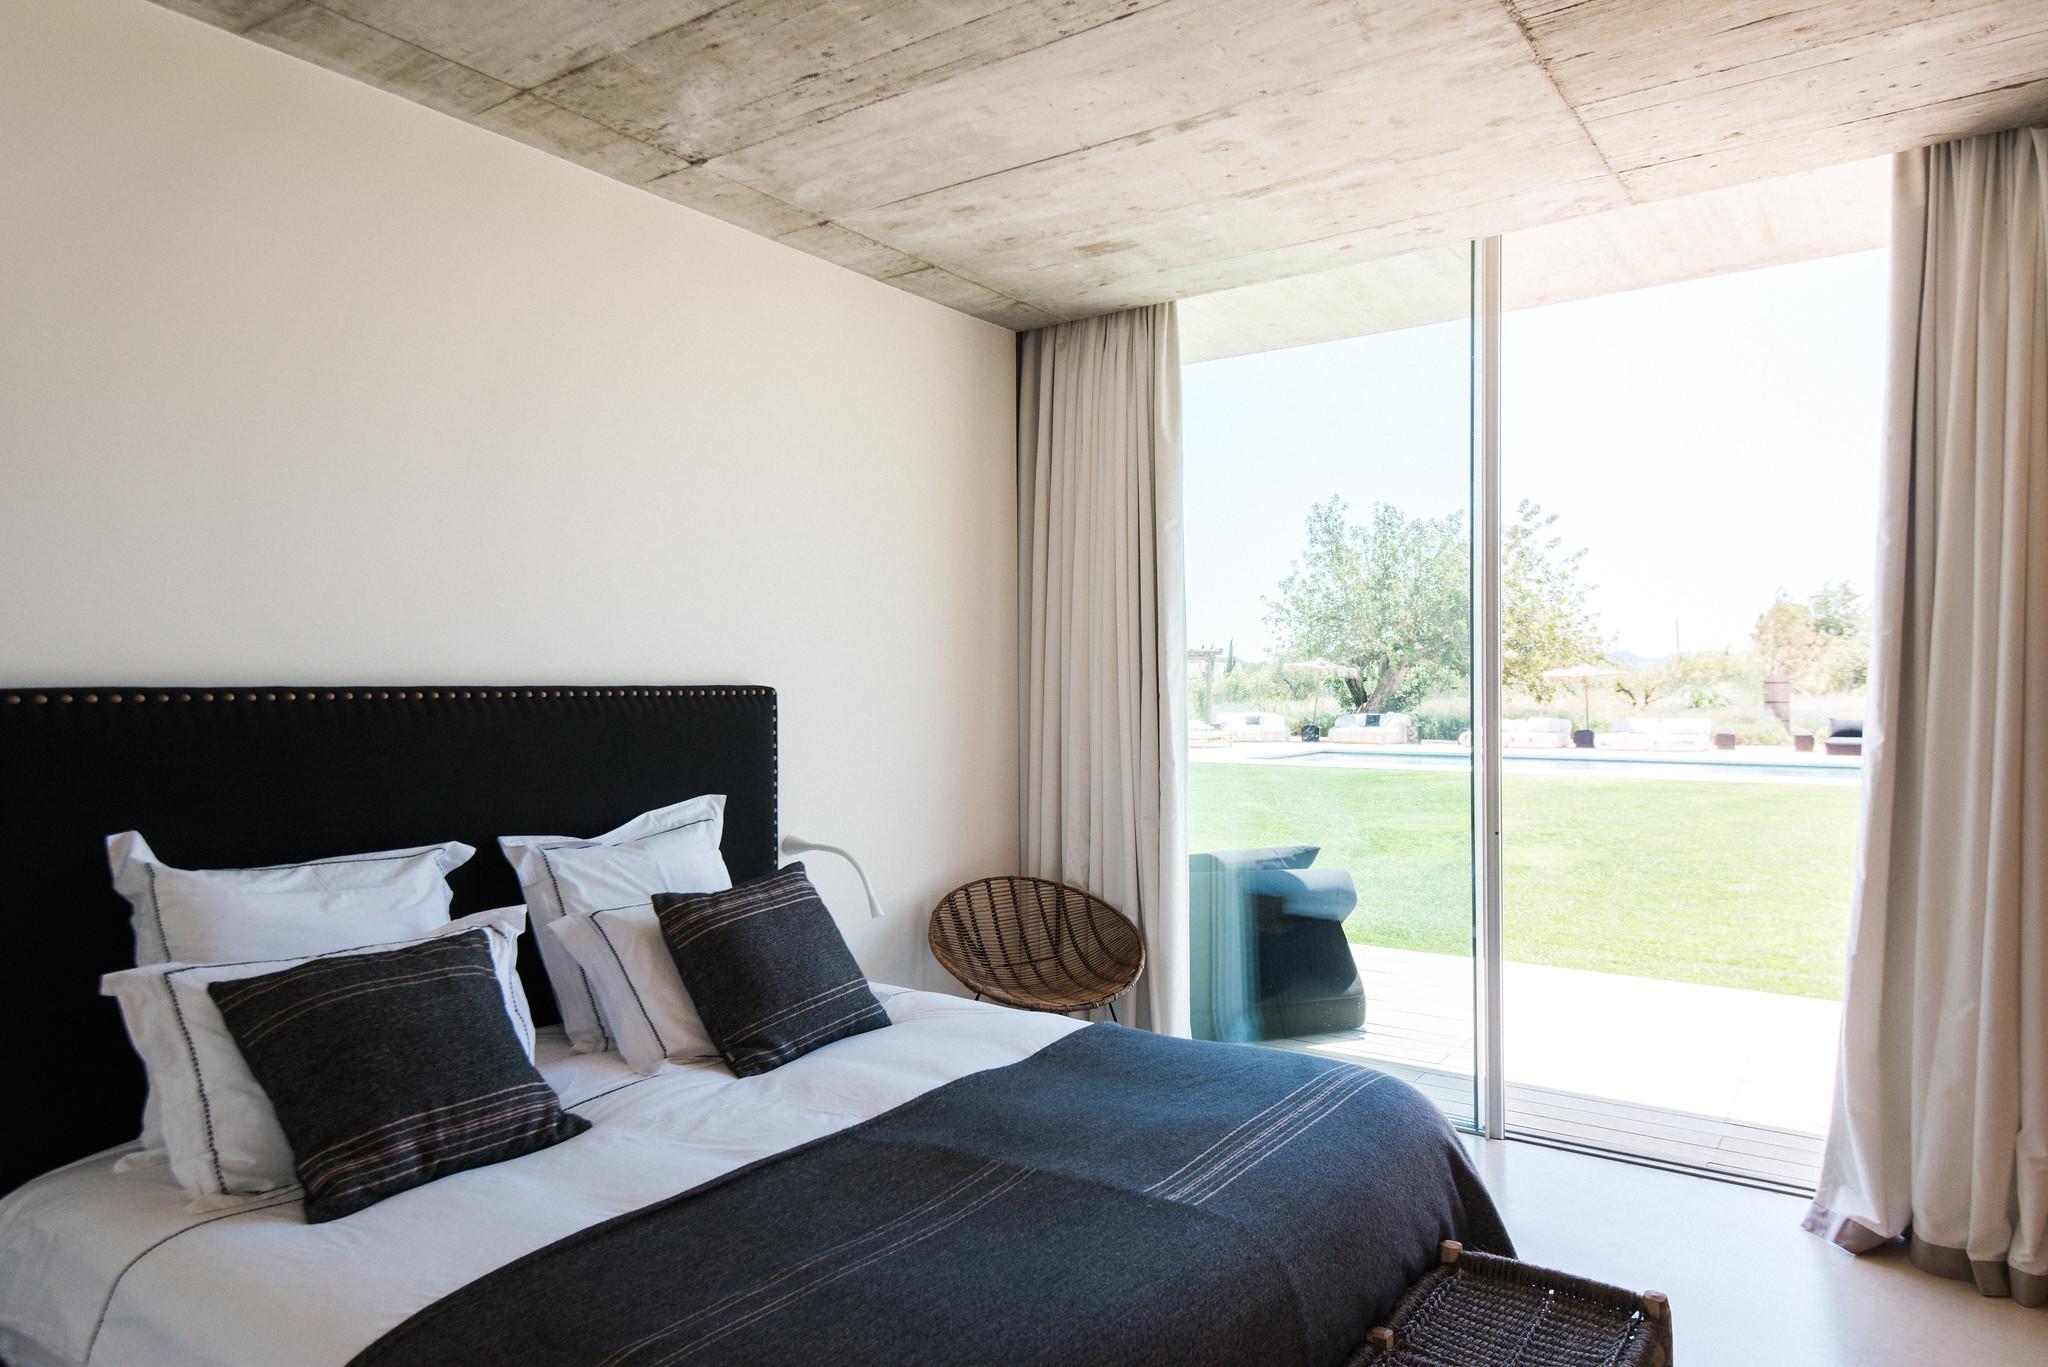 https://www.white-ibiza.com/wp-content/uploads/2020/06/white-ibiza-villas-casa-valentina-interior-bedroom4.jpg